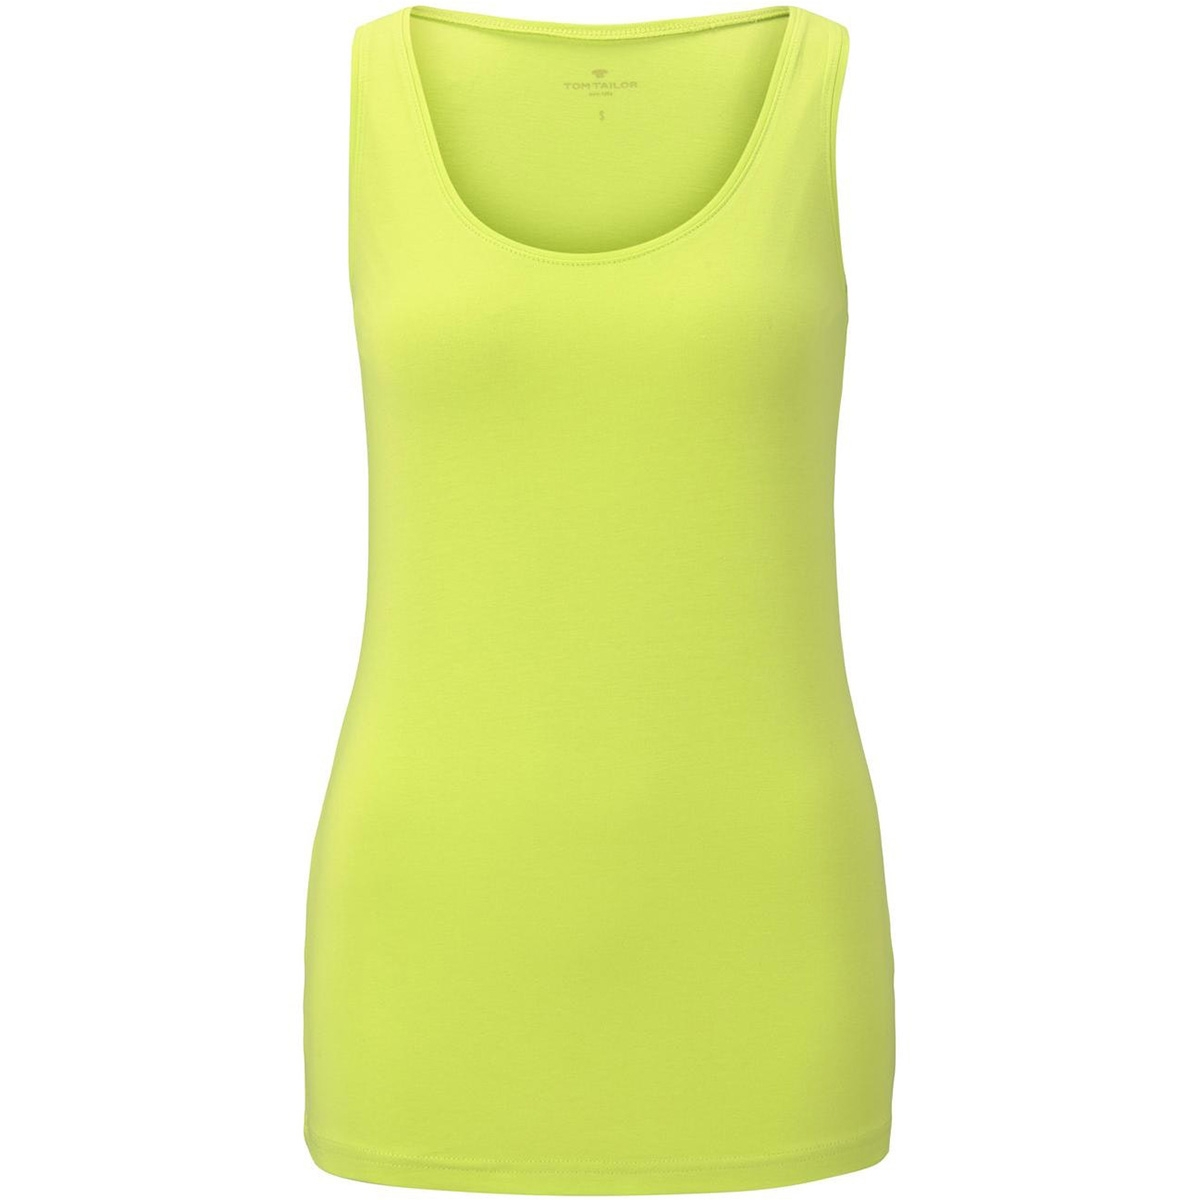 basic top 1018416xx70 tom tailor top 22429